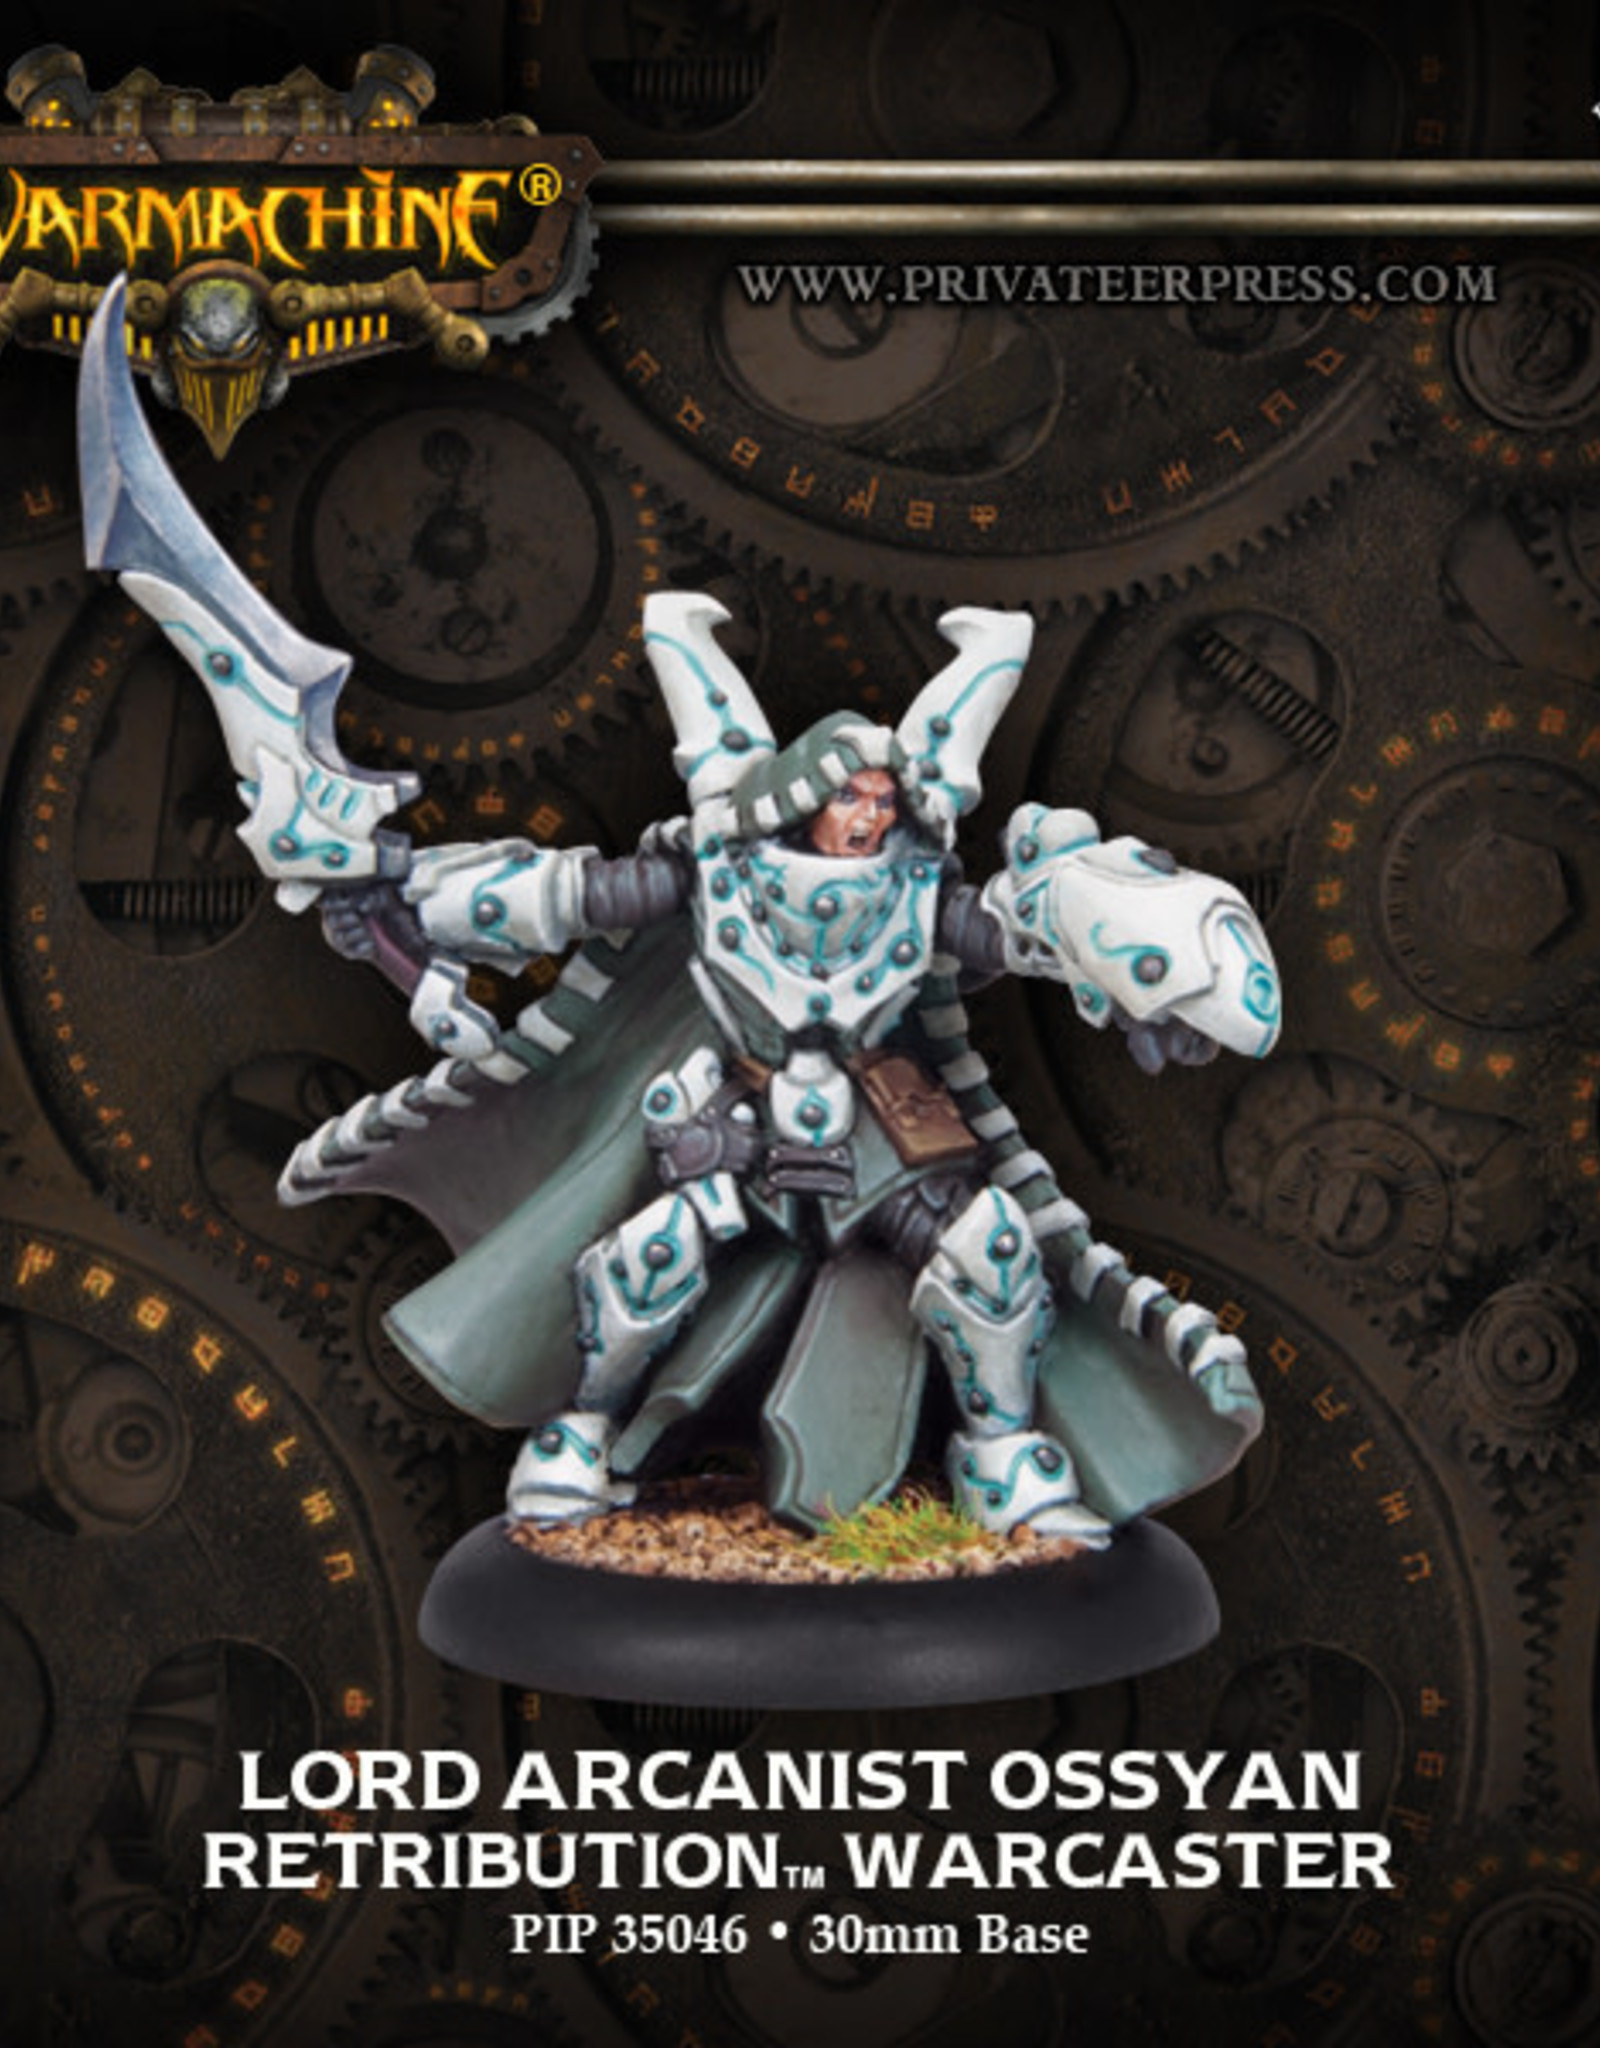 Warmachine Scyrah - Lord Arcanist Ossyan